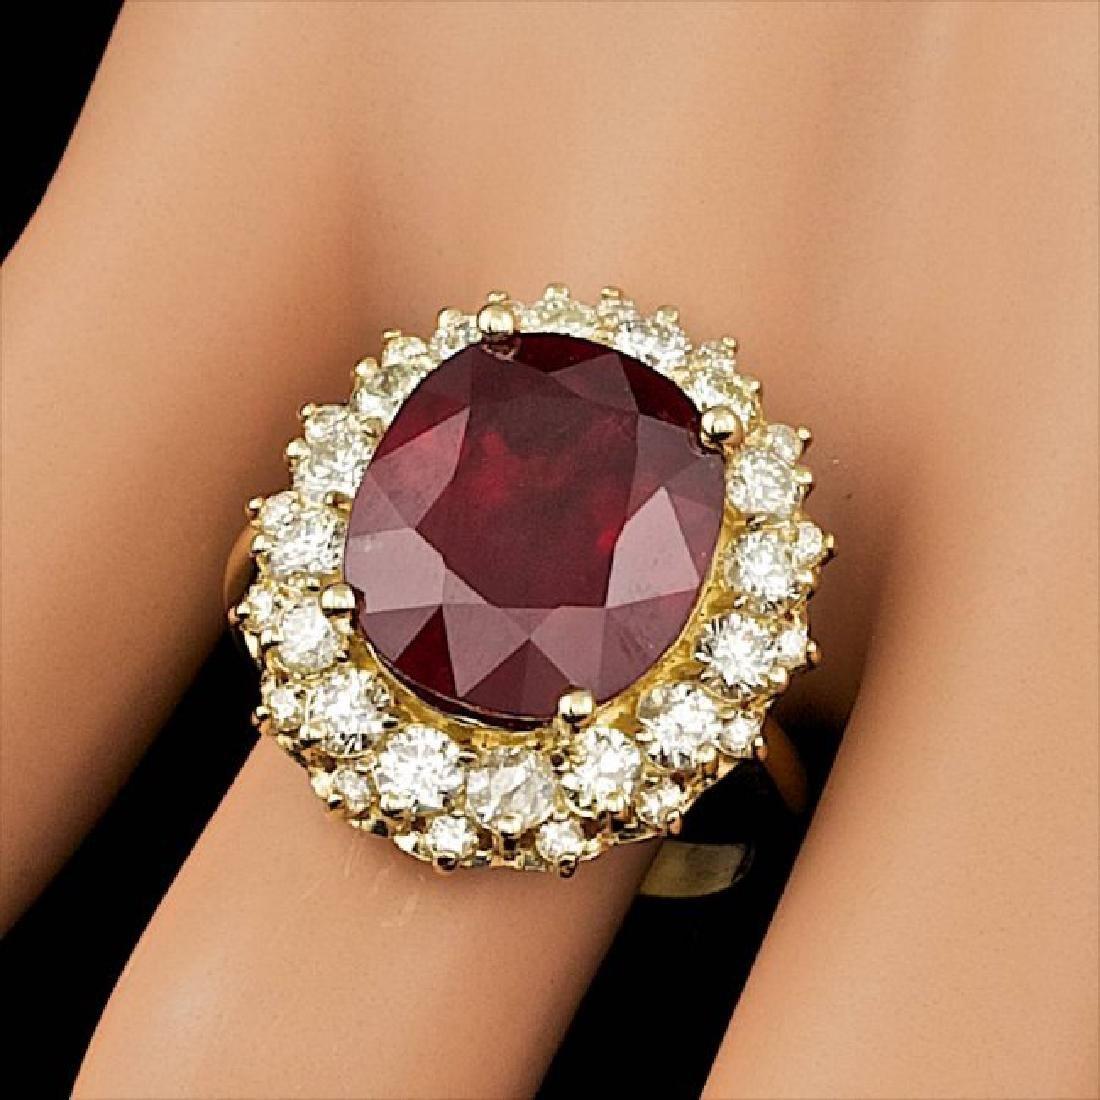 14k Yellow Gold 11.50ct Ruby 1.65ct Diamond Ring - 3